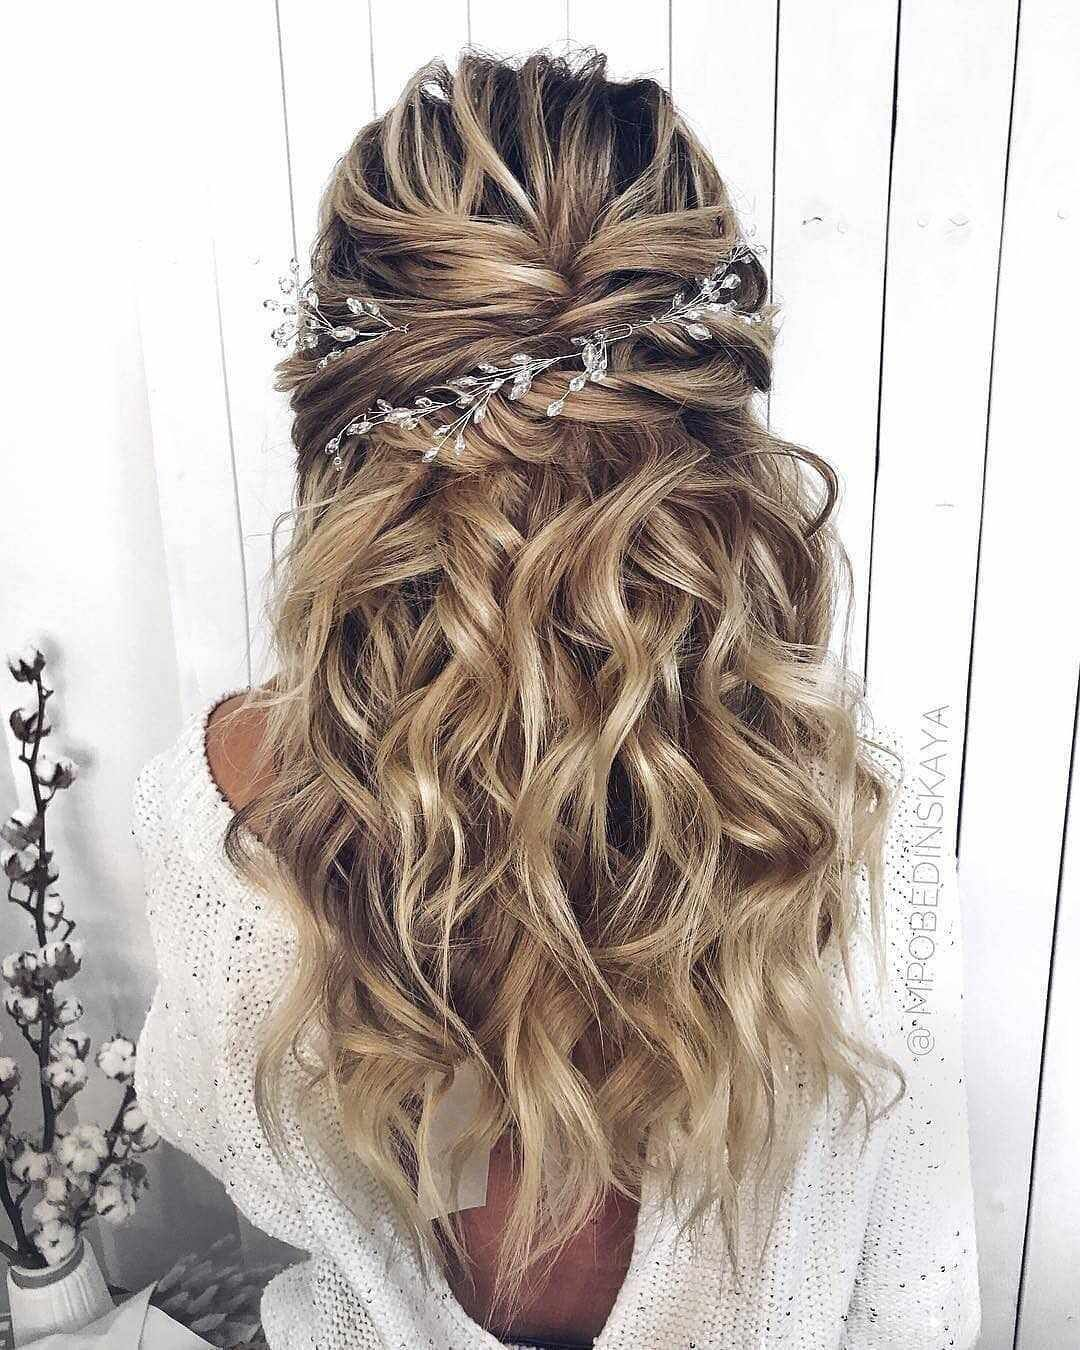 Top 40 Best Wedding Hairstyles For Long Hair 2019 Eazy Vibe Wedding Hairstyles For Long Hair Veil Hairstyles Long Hair Styles